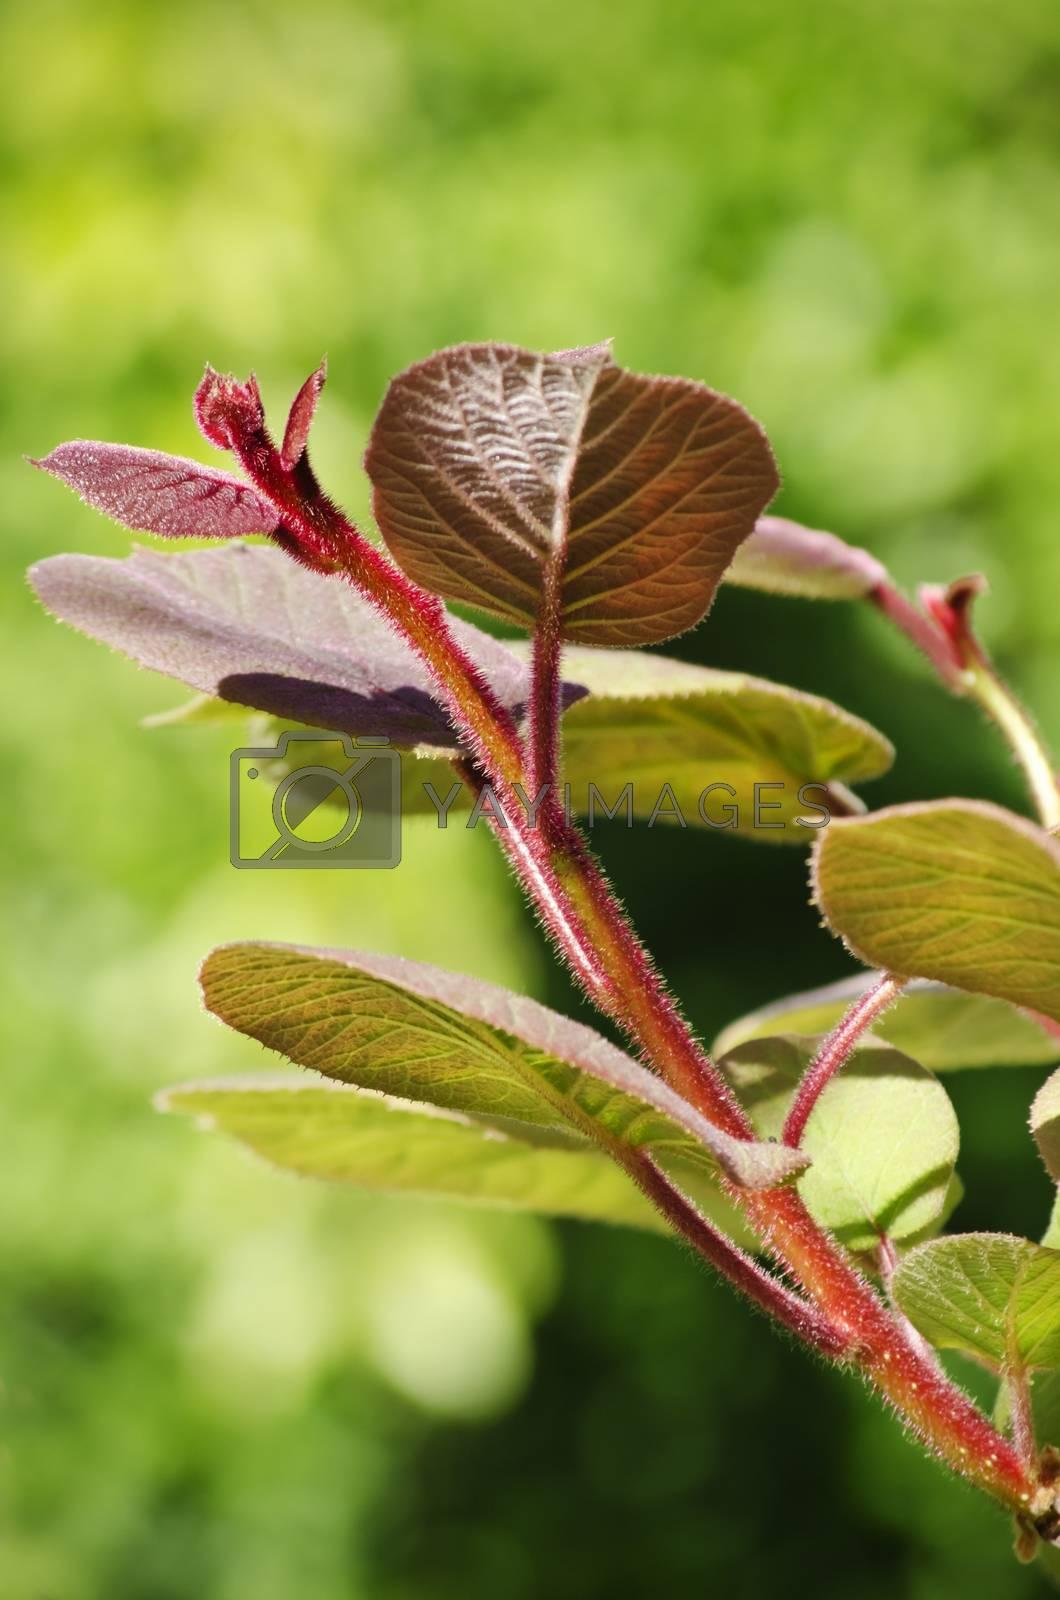 Photo of Spring Kiwi Leaf Over Green